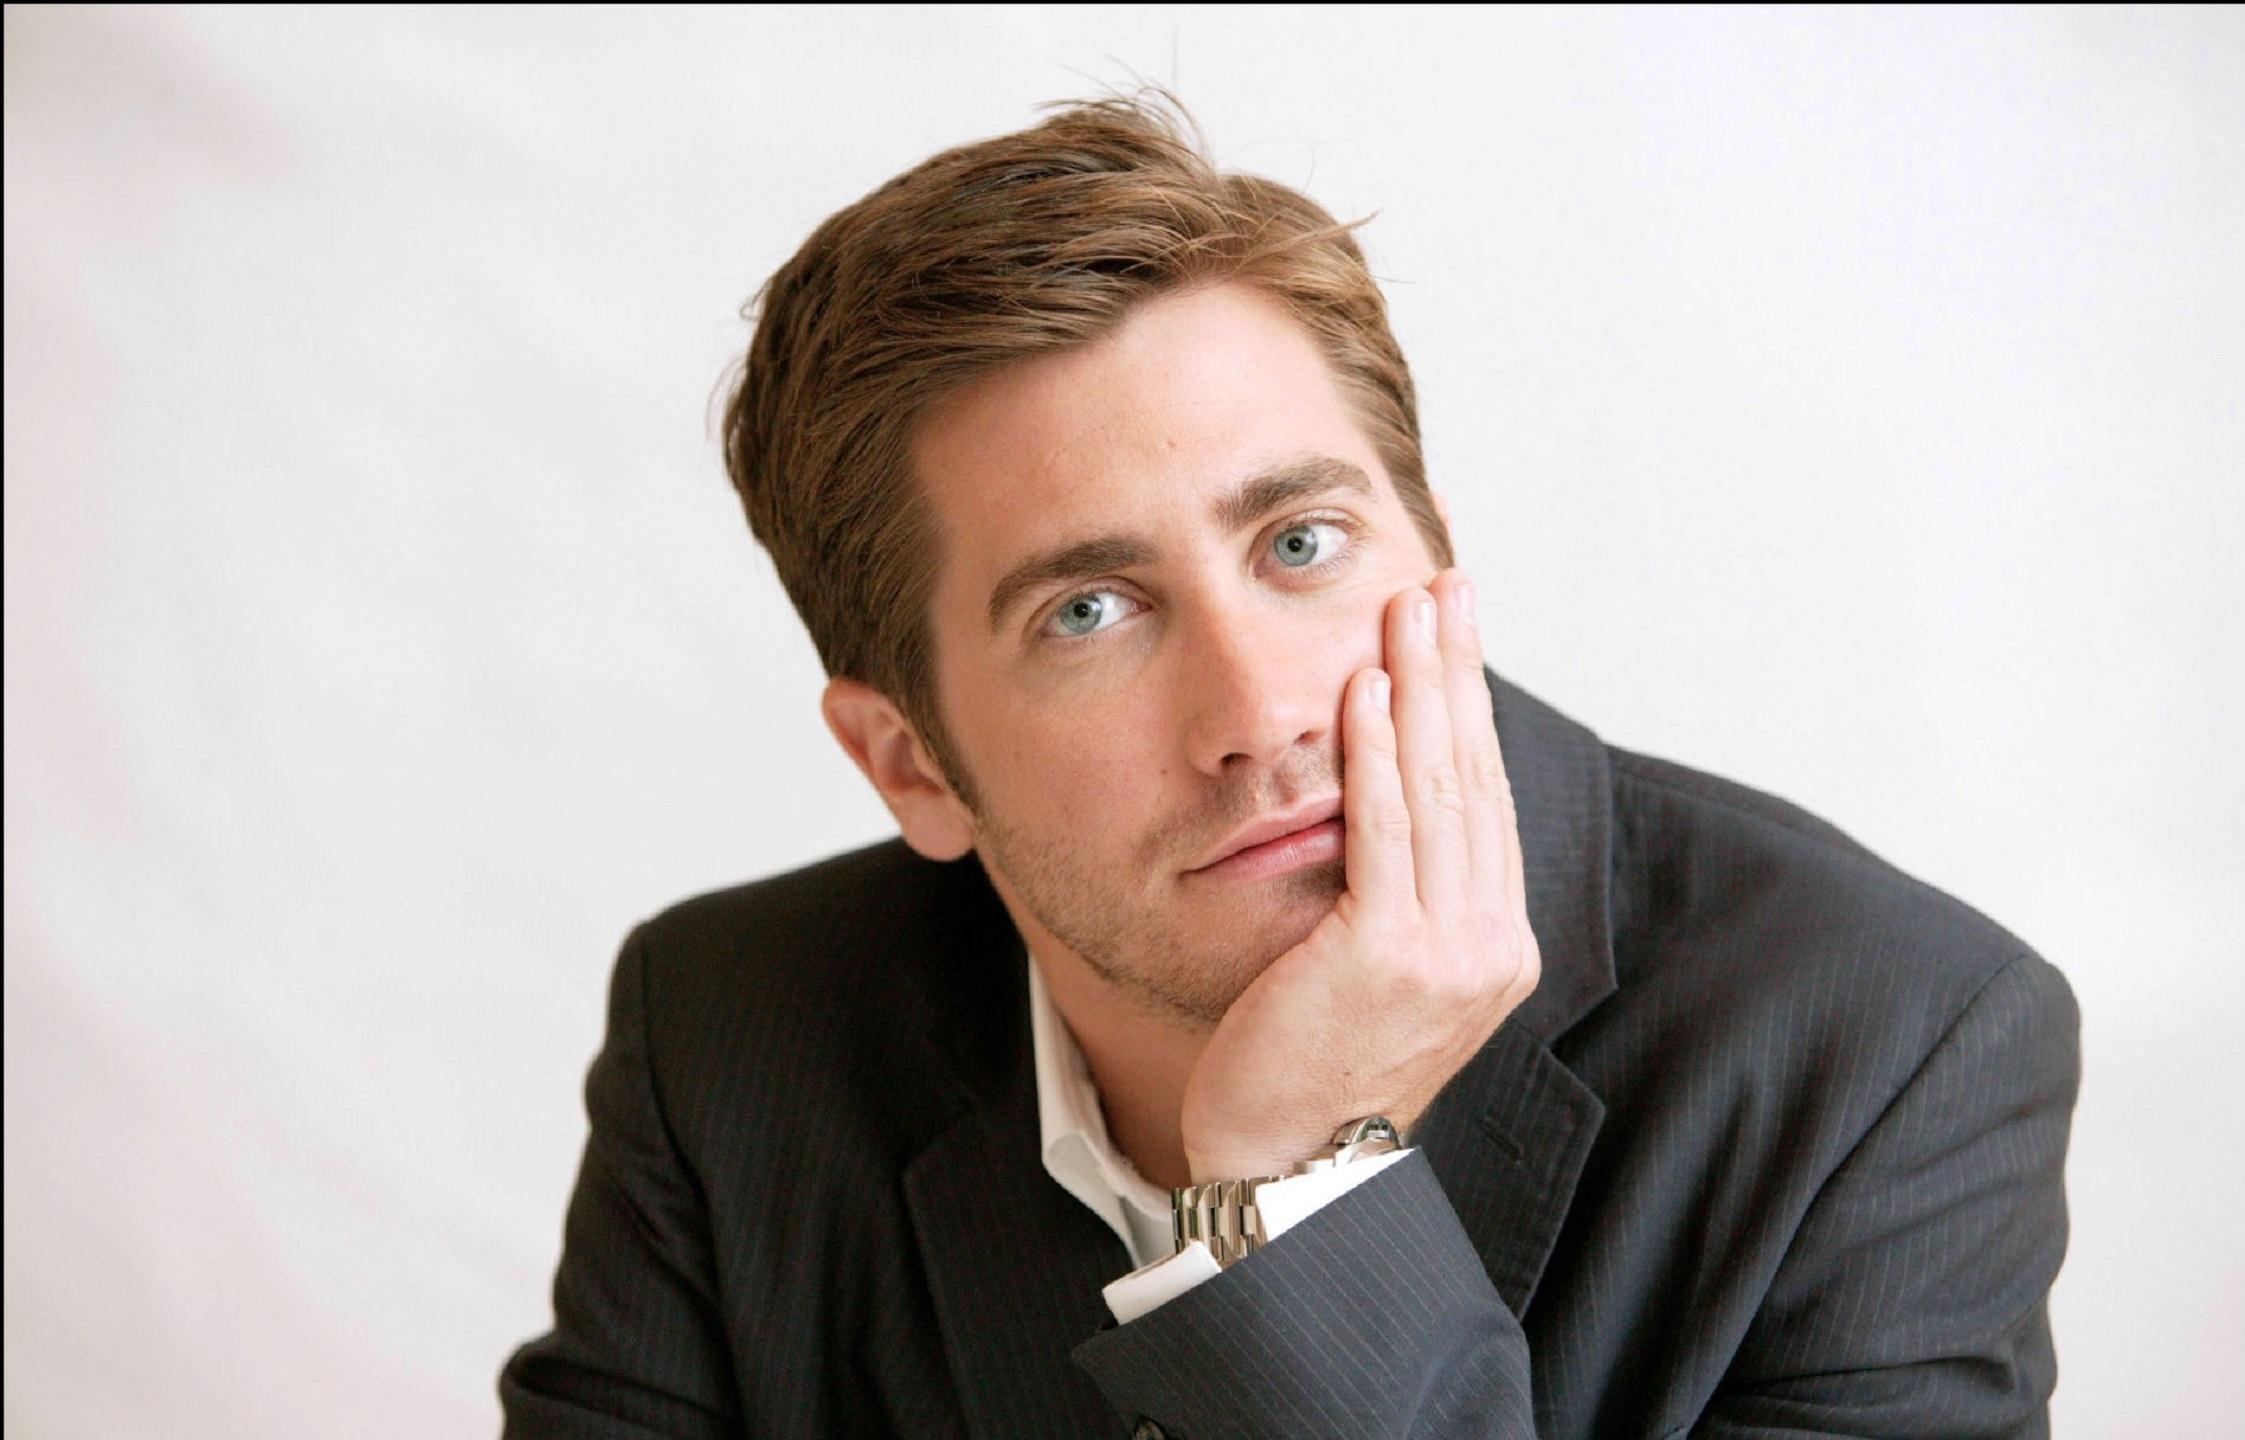 Jake Gyllenhaal High Quality Wallpapers